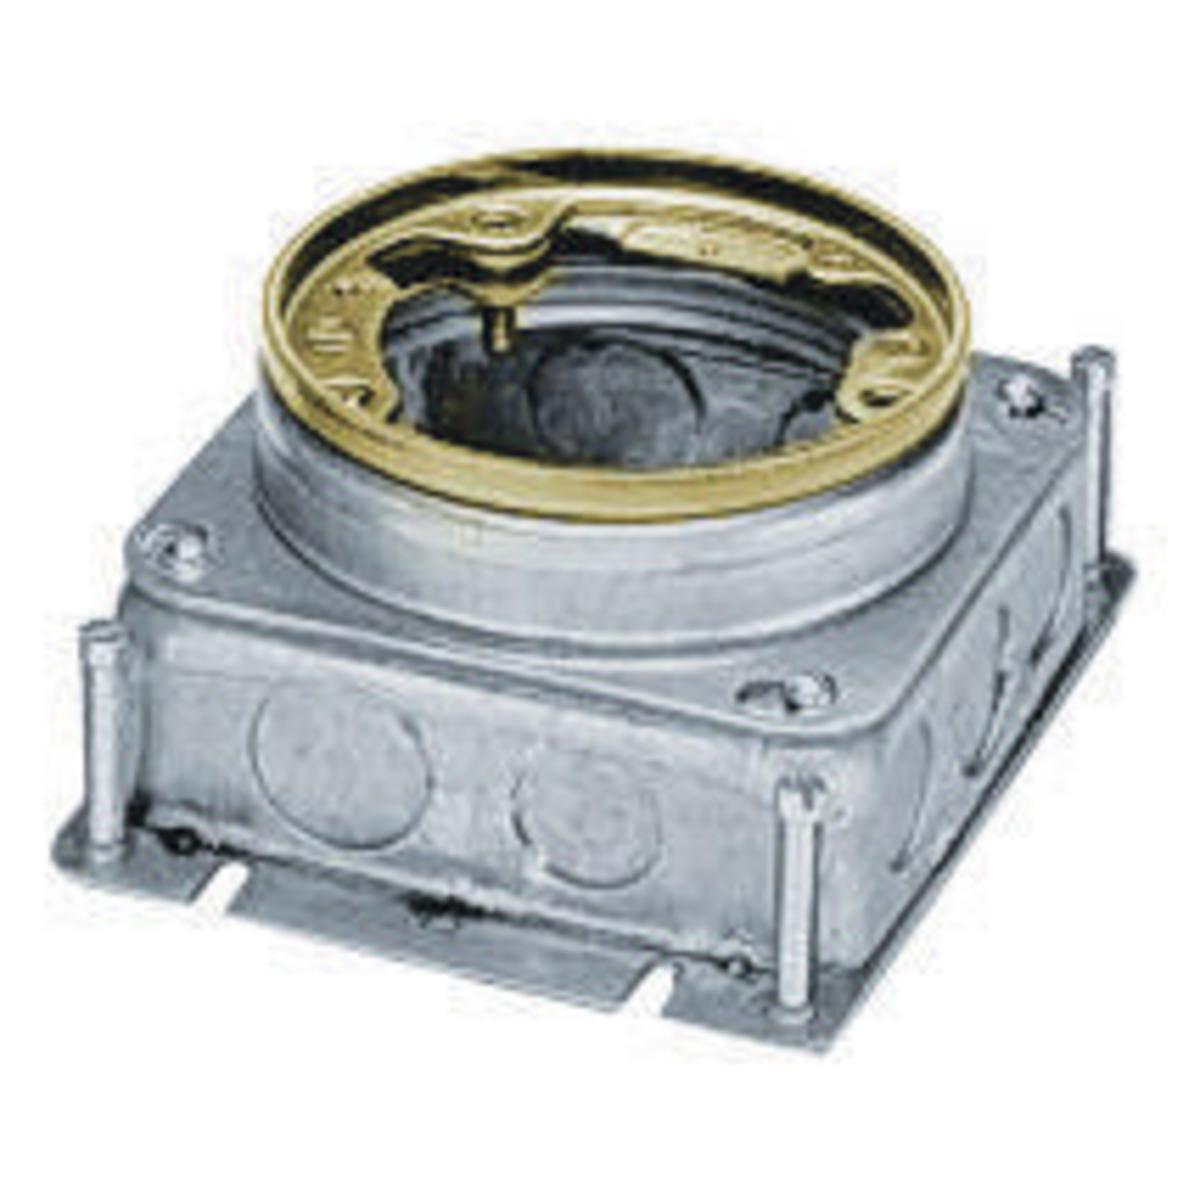 Hubbell B2529 37.3 In? Brass Stamped Steel Round Floor Box